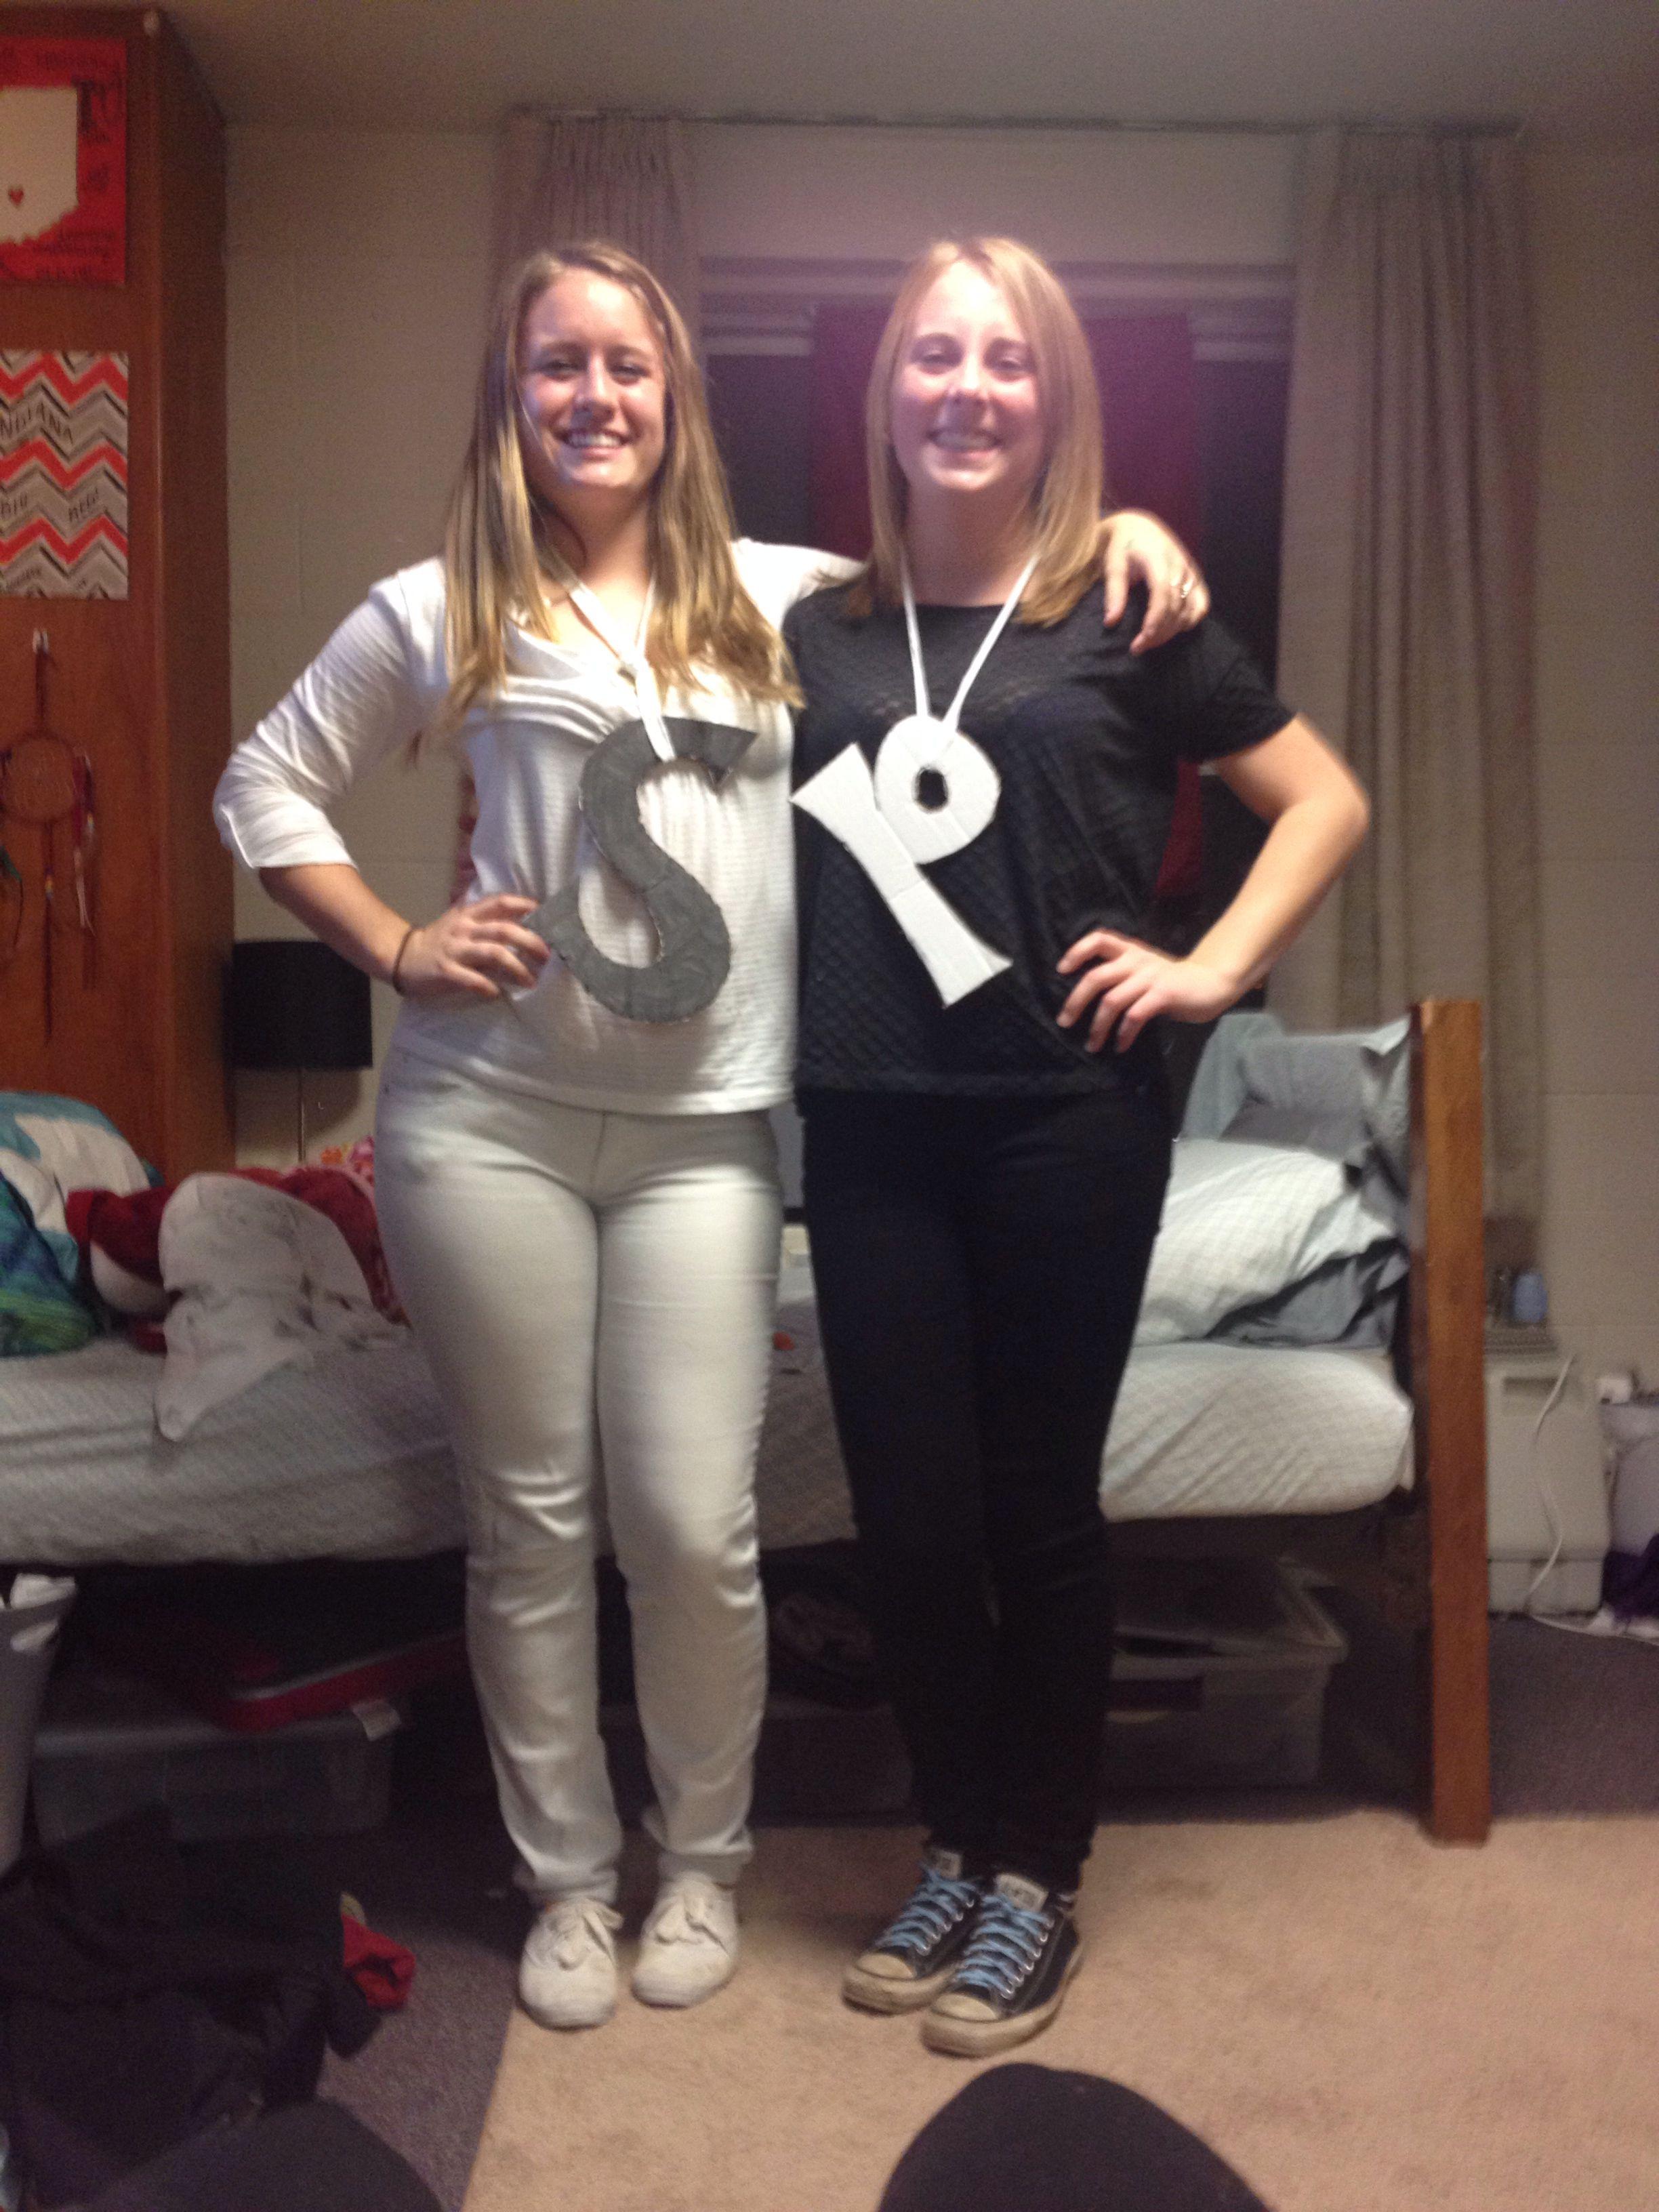 Salt And Pepper Halloween Costume